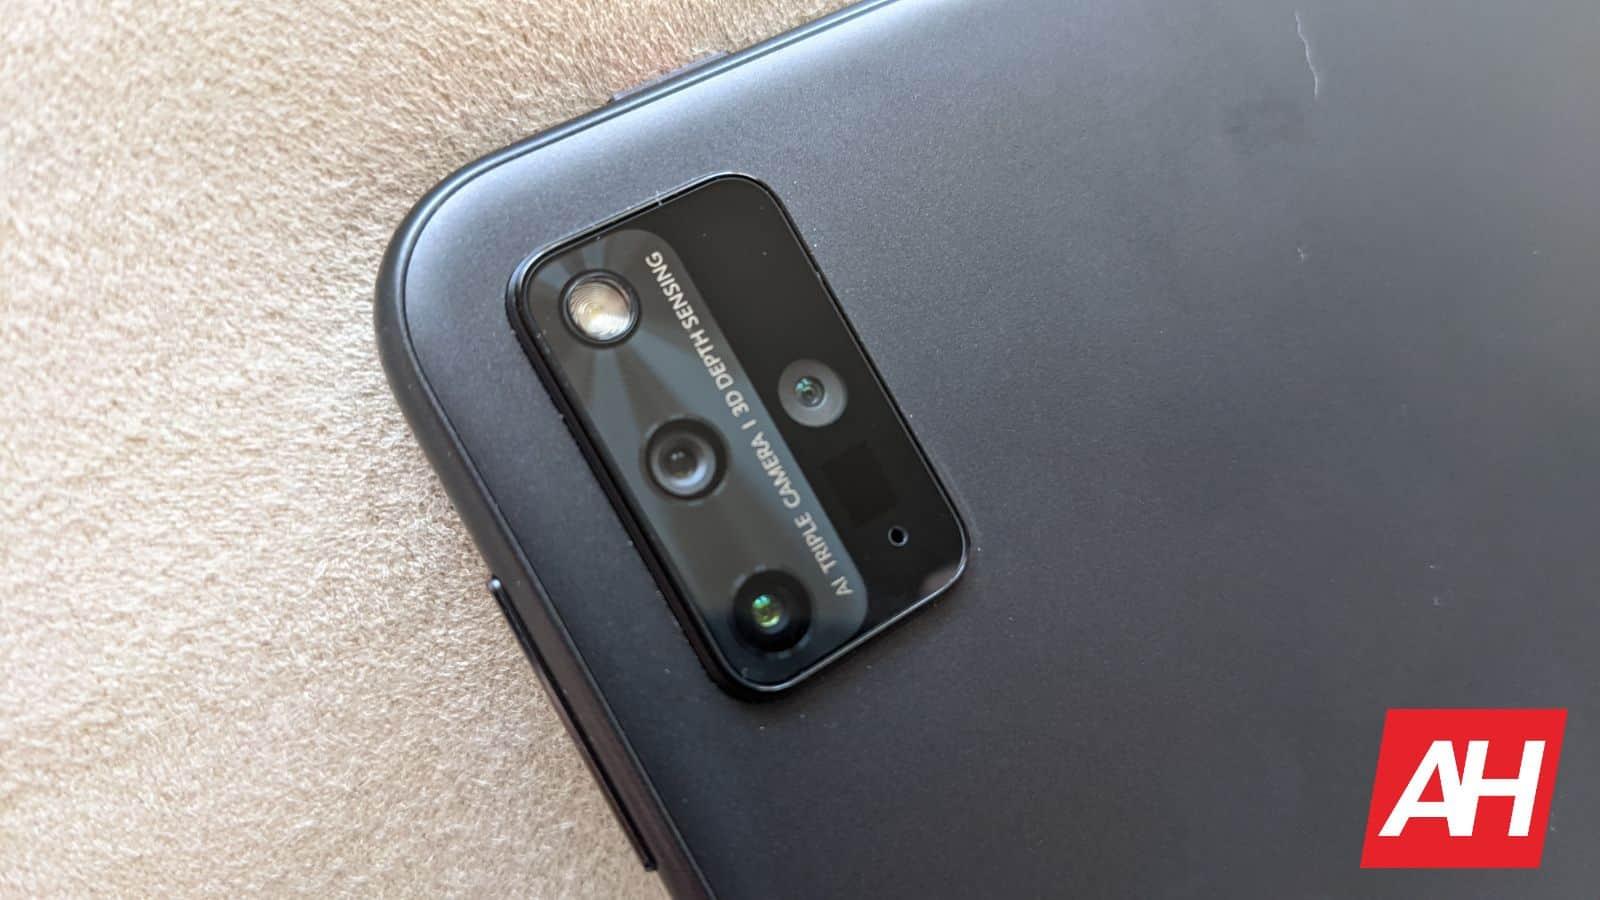 AH Huawei MatePad 12 6 image 18